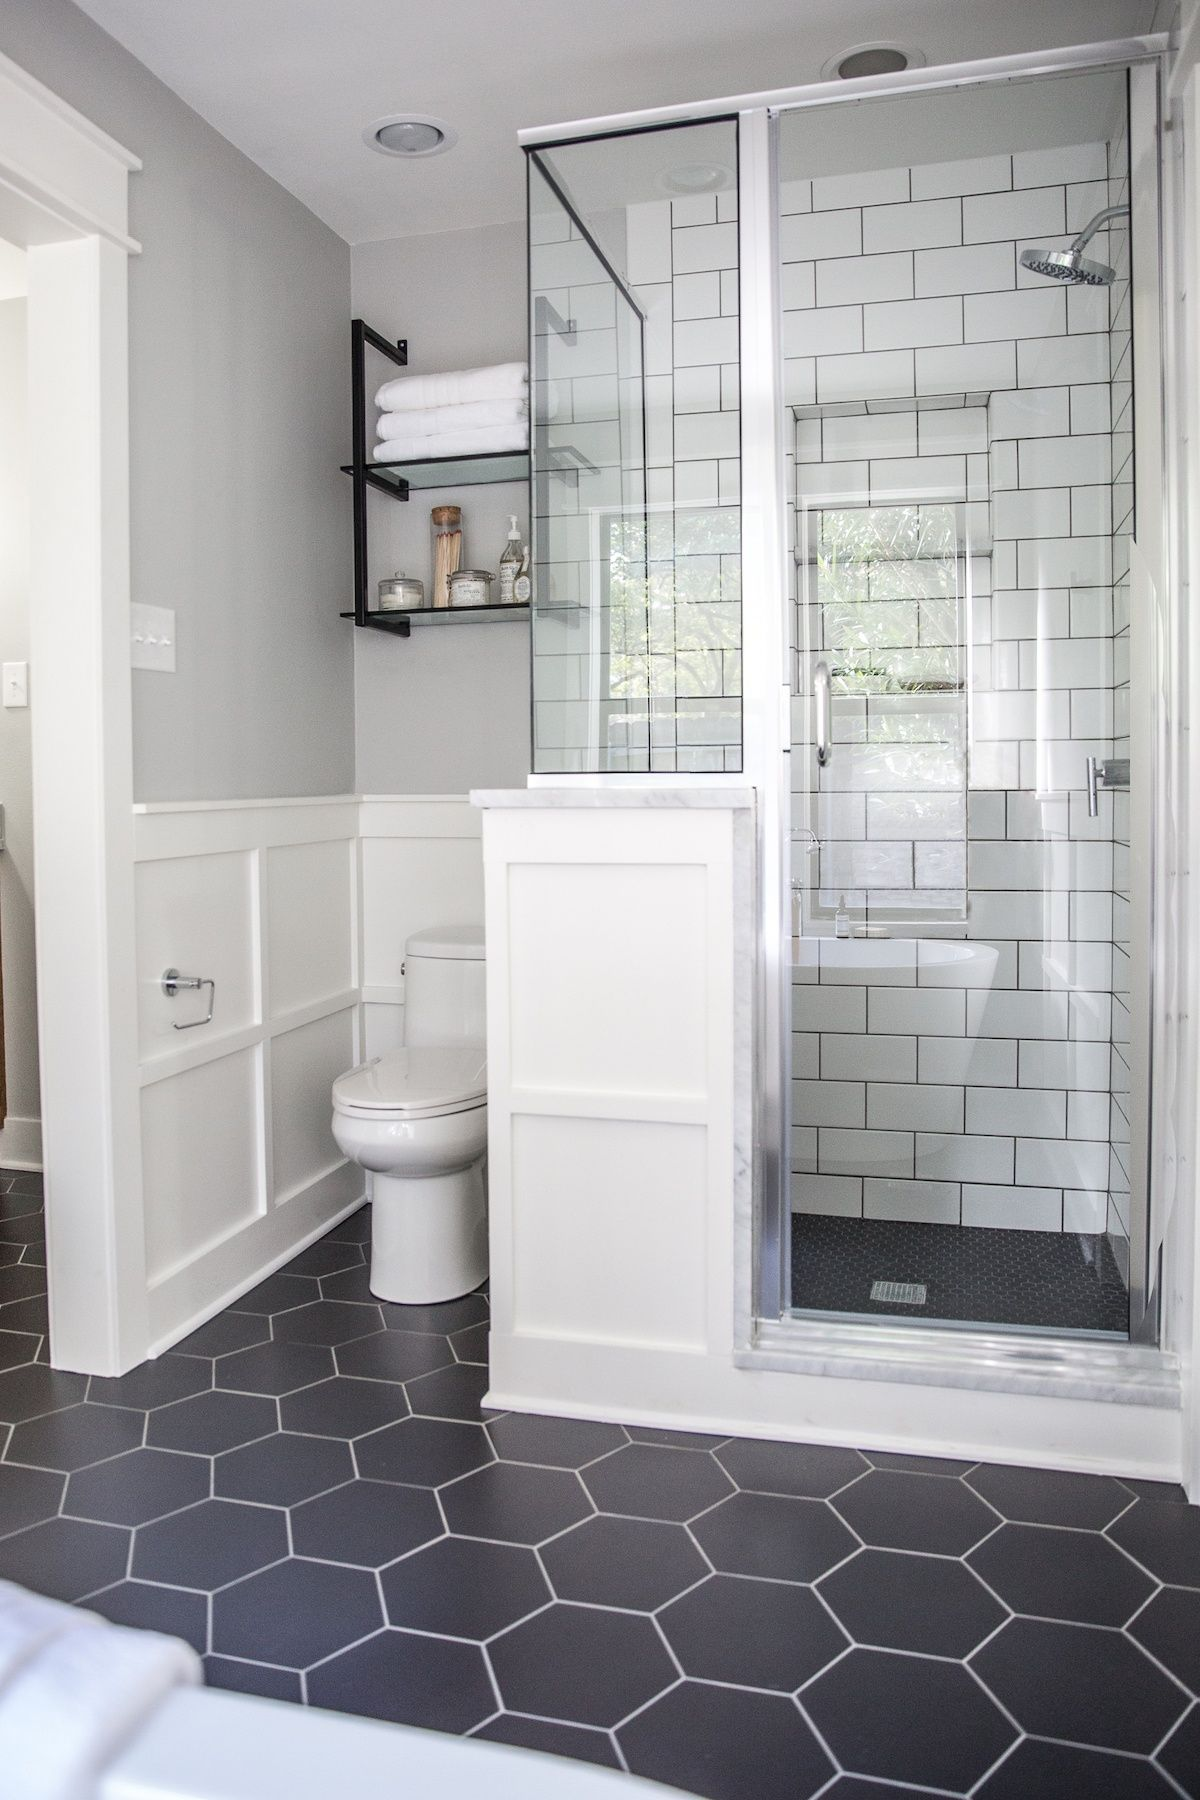 Kleine spa-ähnliche badezimmerideen we used large hexagonal flooring throughout the whole bathroom i